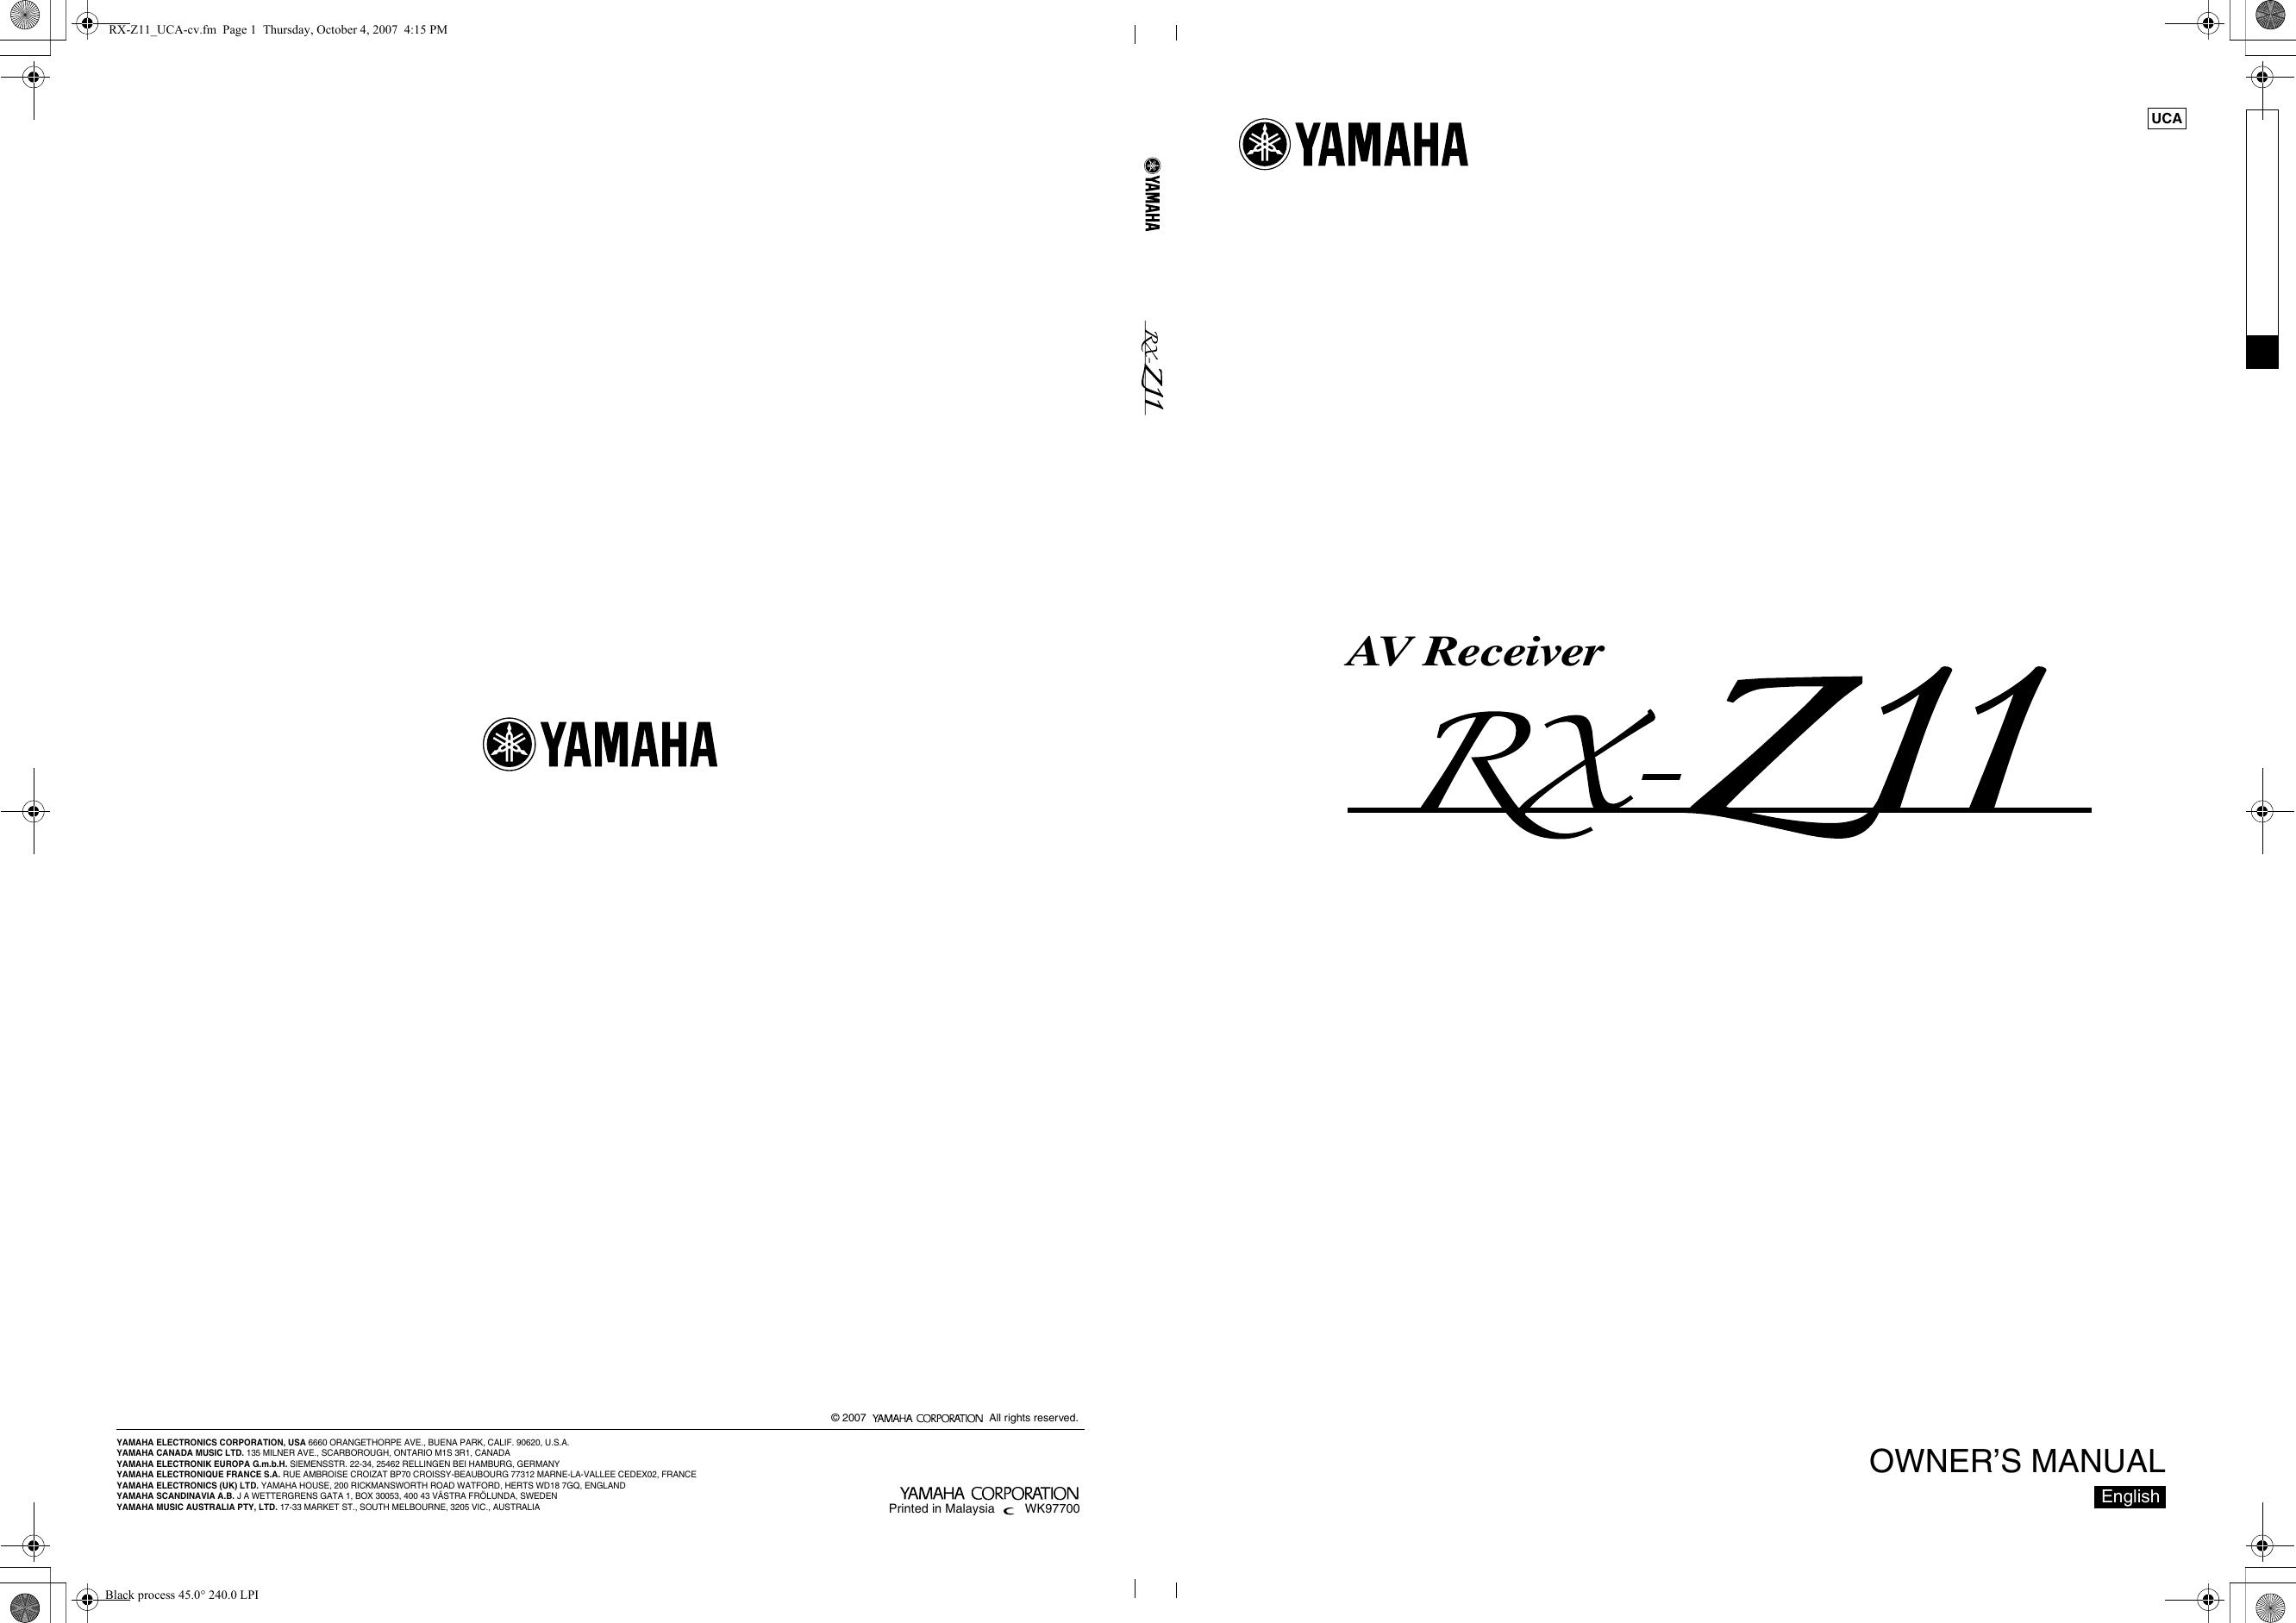 Rxz owner manual daily instruction manual guides yamaha rx z11 owners manual rh usermanual wiki rxz thai basikal rxz fandeluxe Images